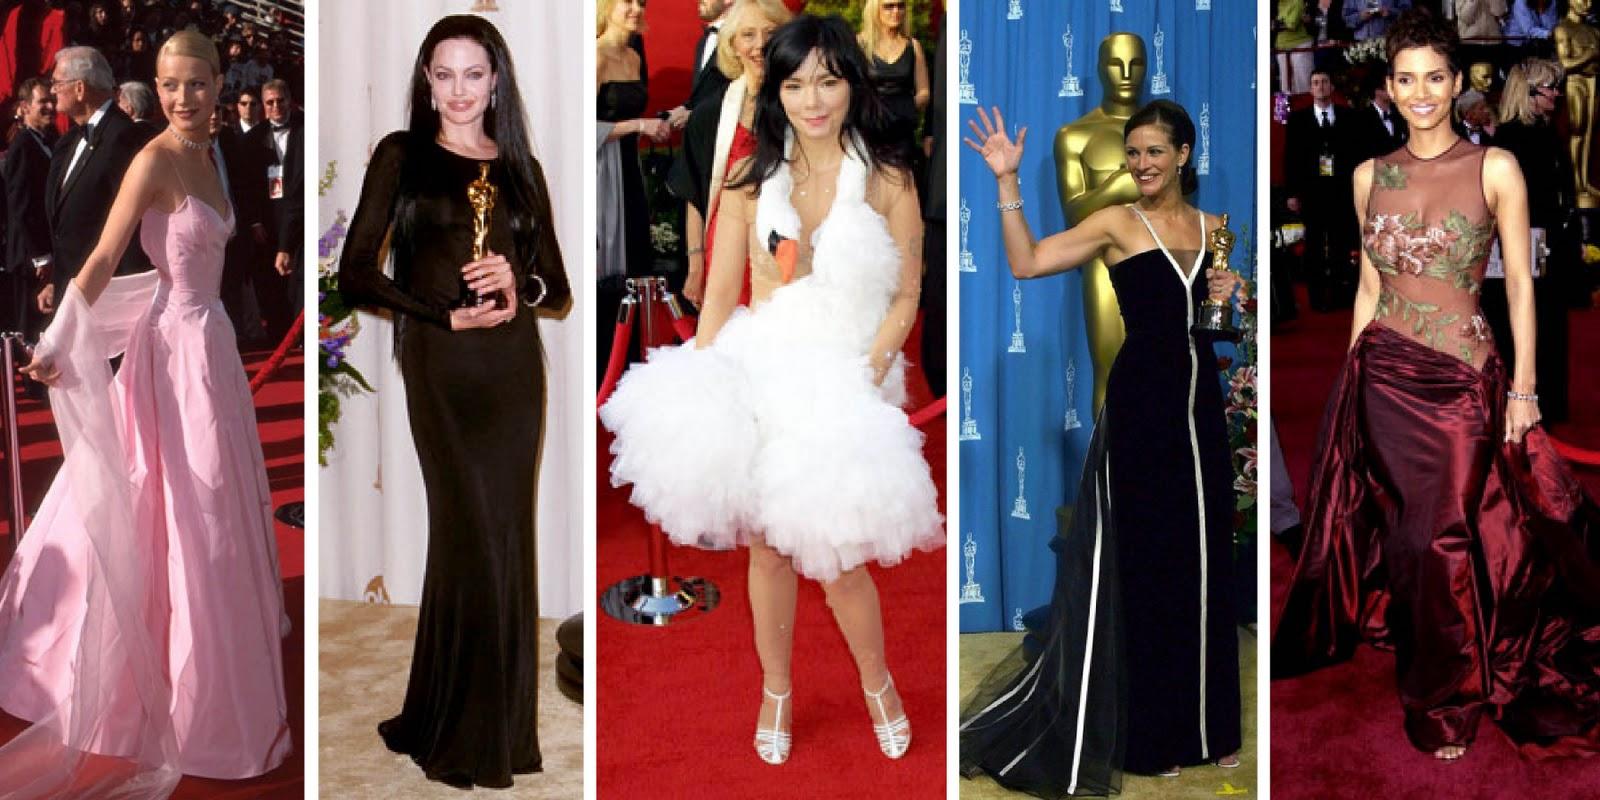 http://2.bp.blogspot.com/-d3PjbkQfWZk/TVlGjlTaP0I/AAAAAAAABDI/C7lGfEk-oWE/s1600/oscar+dresses.jpg